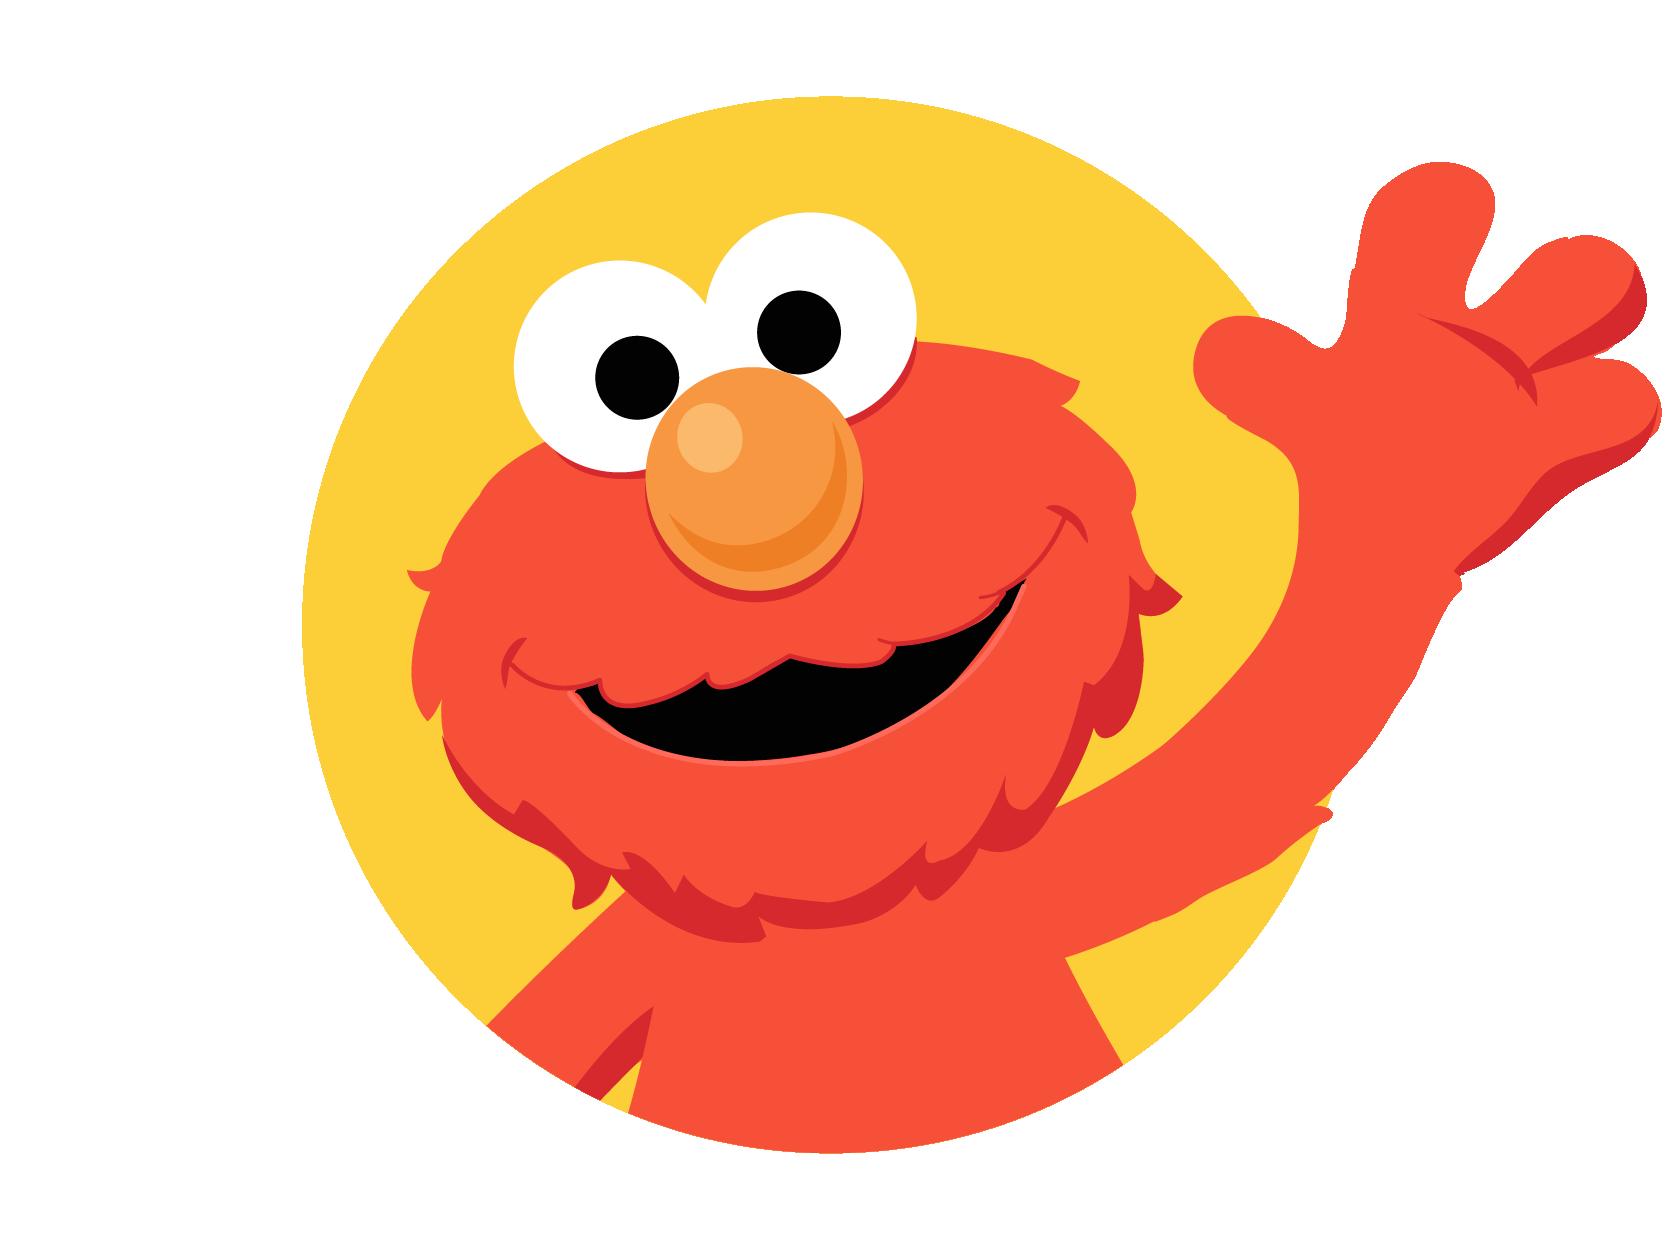 Cookie monster grover sesame. Elmo clipart big bird